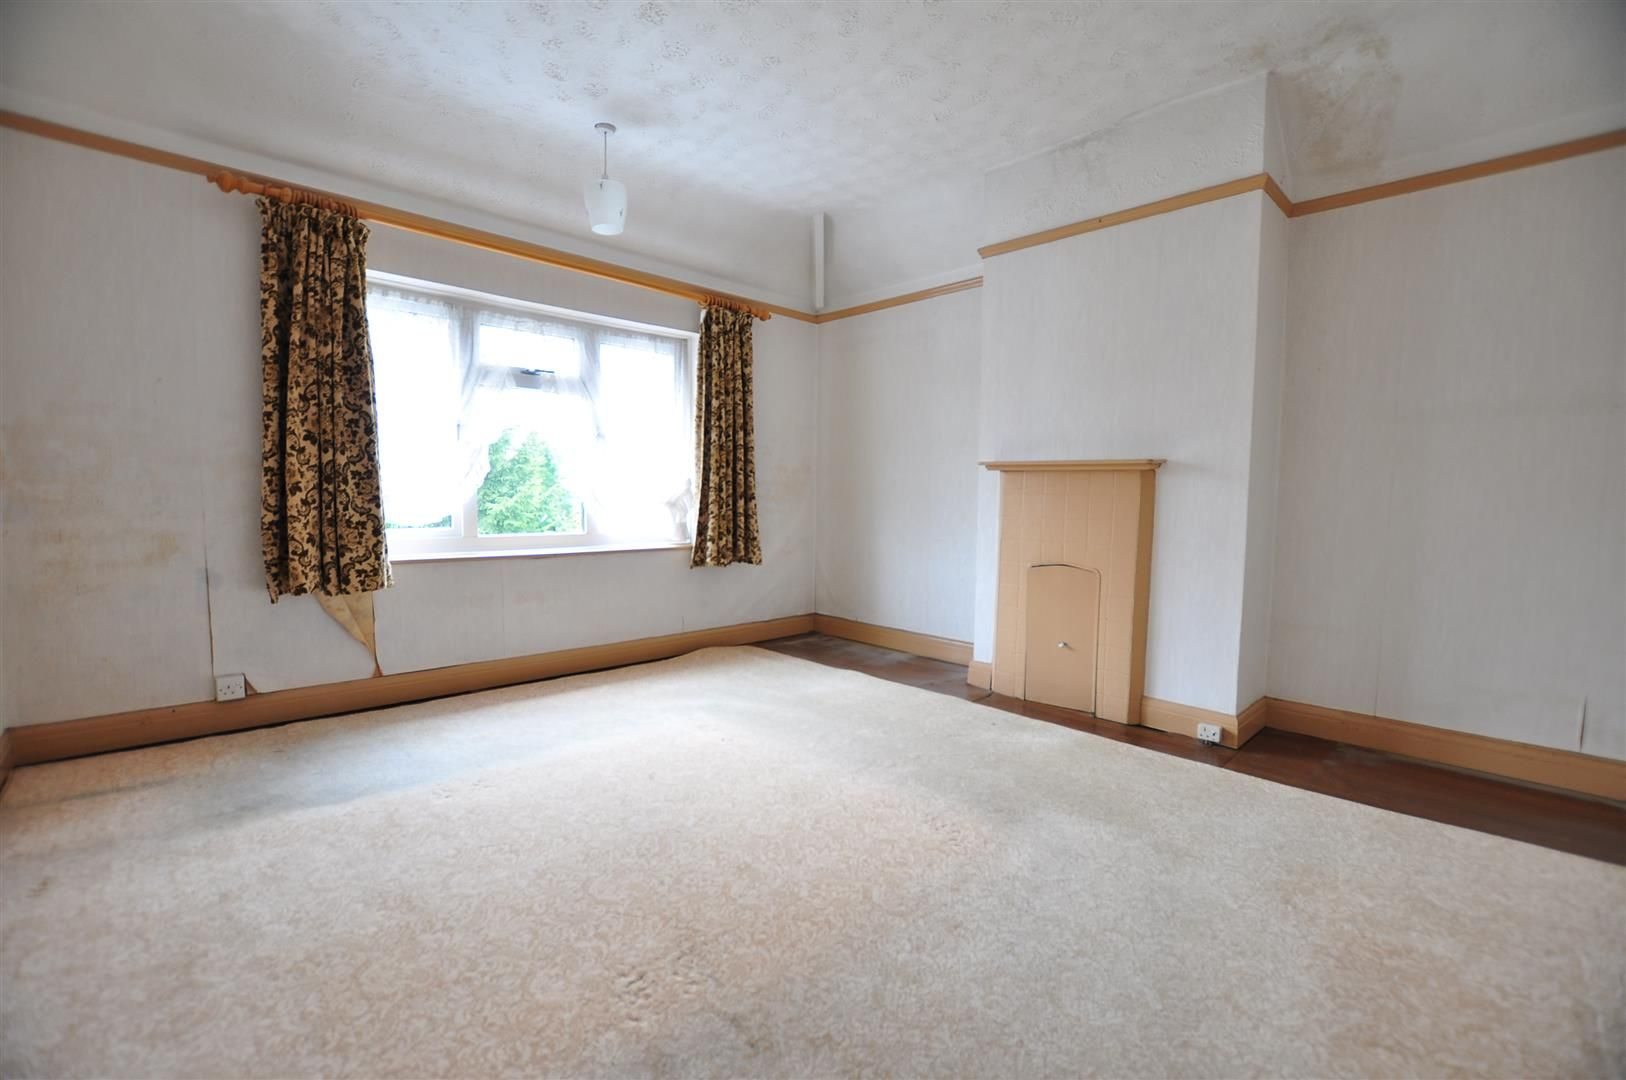 3 bed detached for sale  - Property Image 10